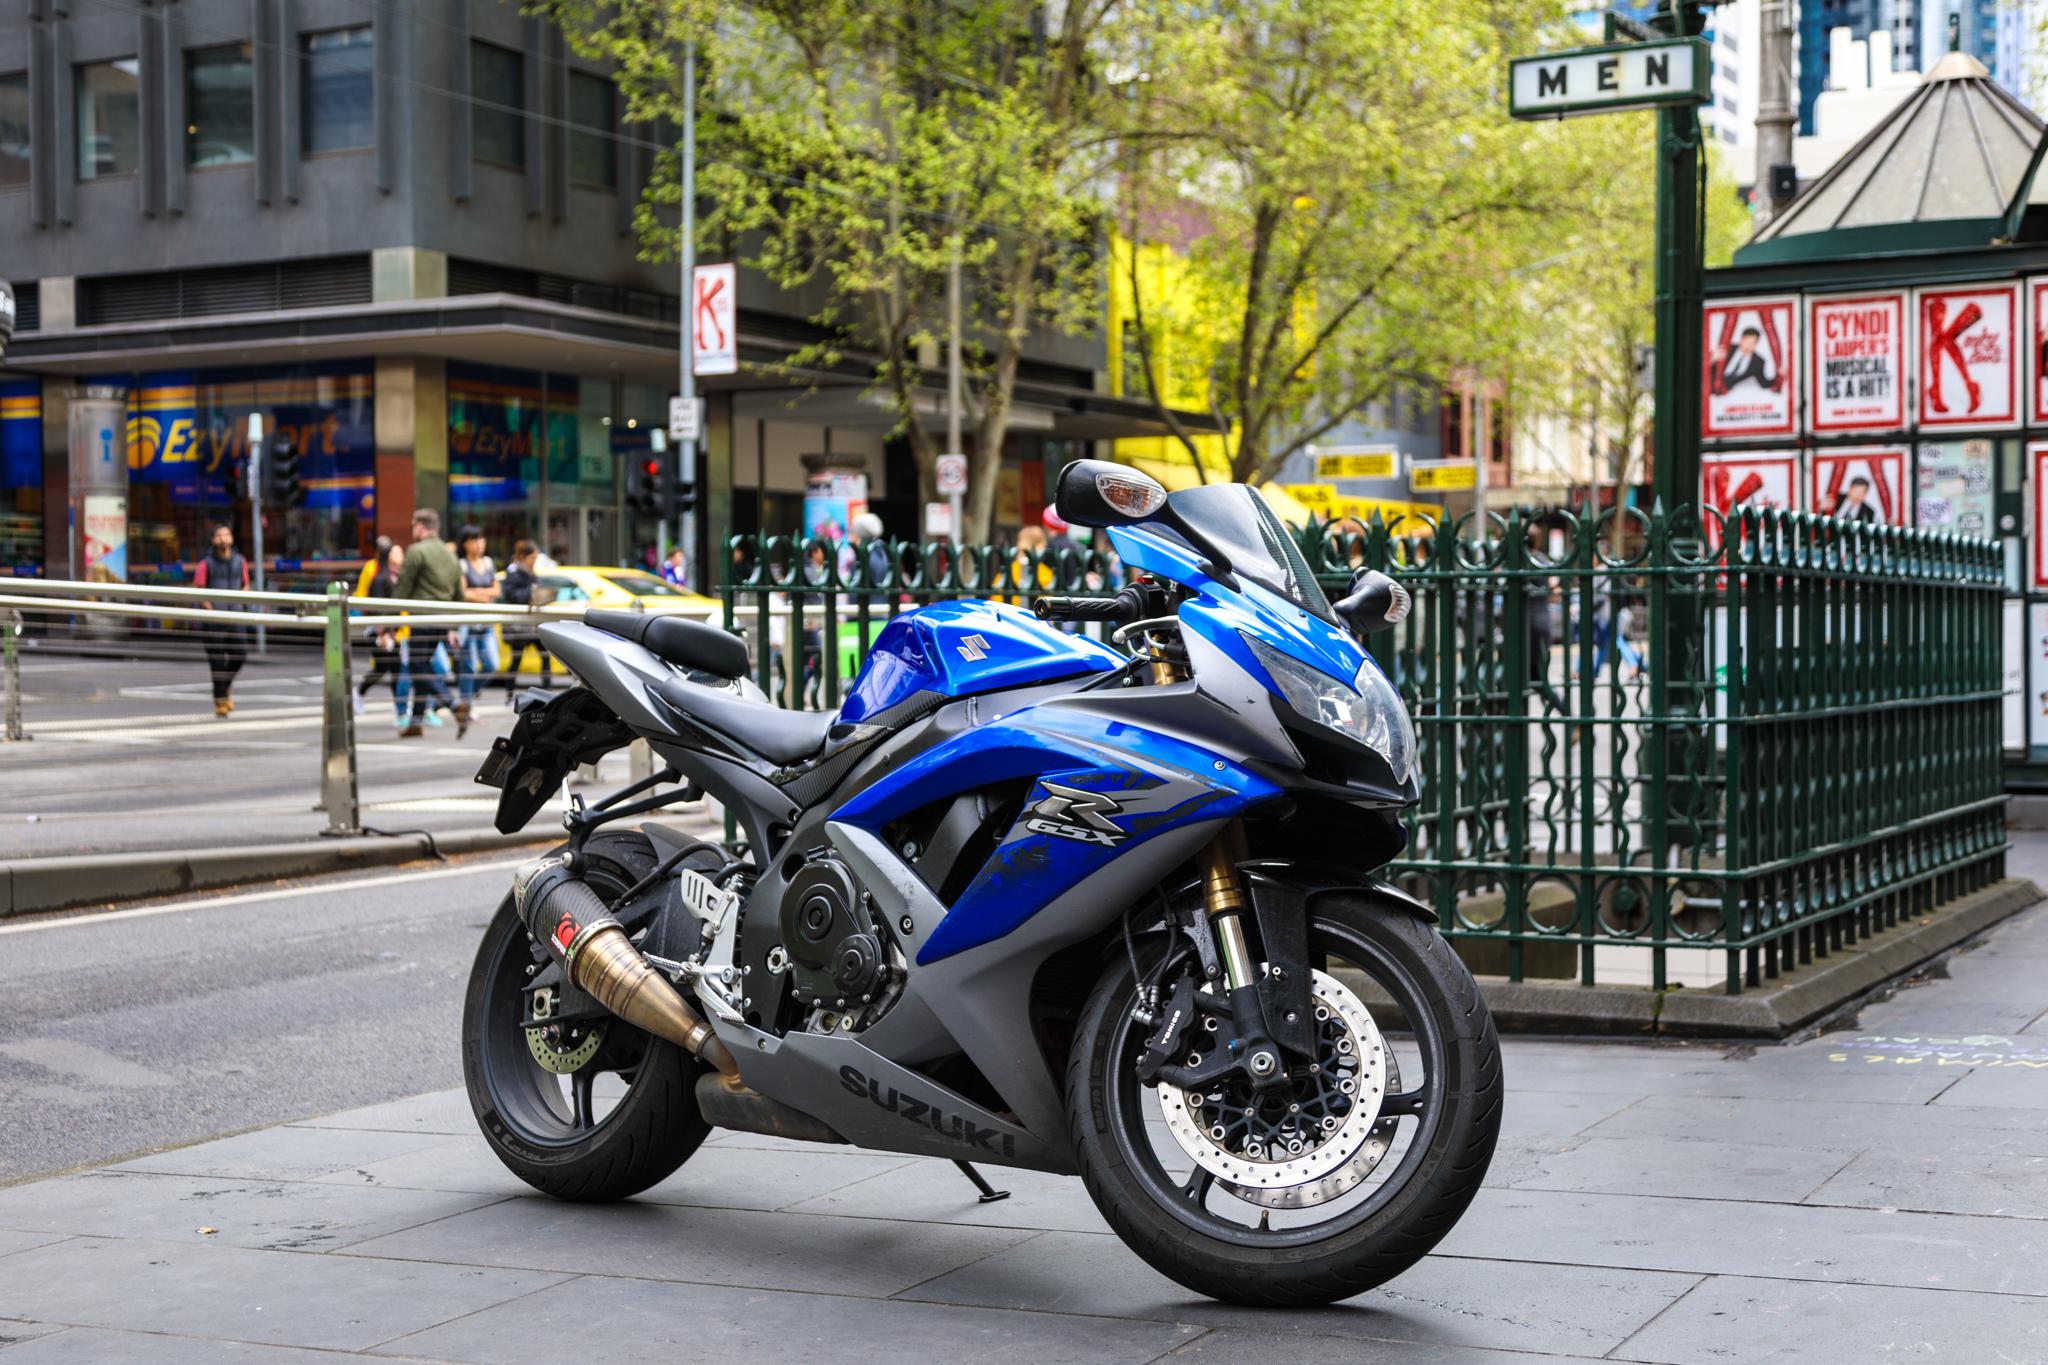 bike-on-payment.jpg